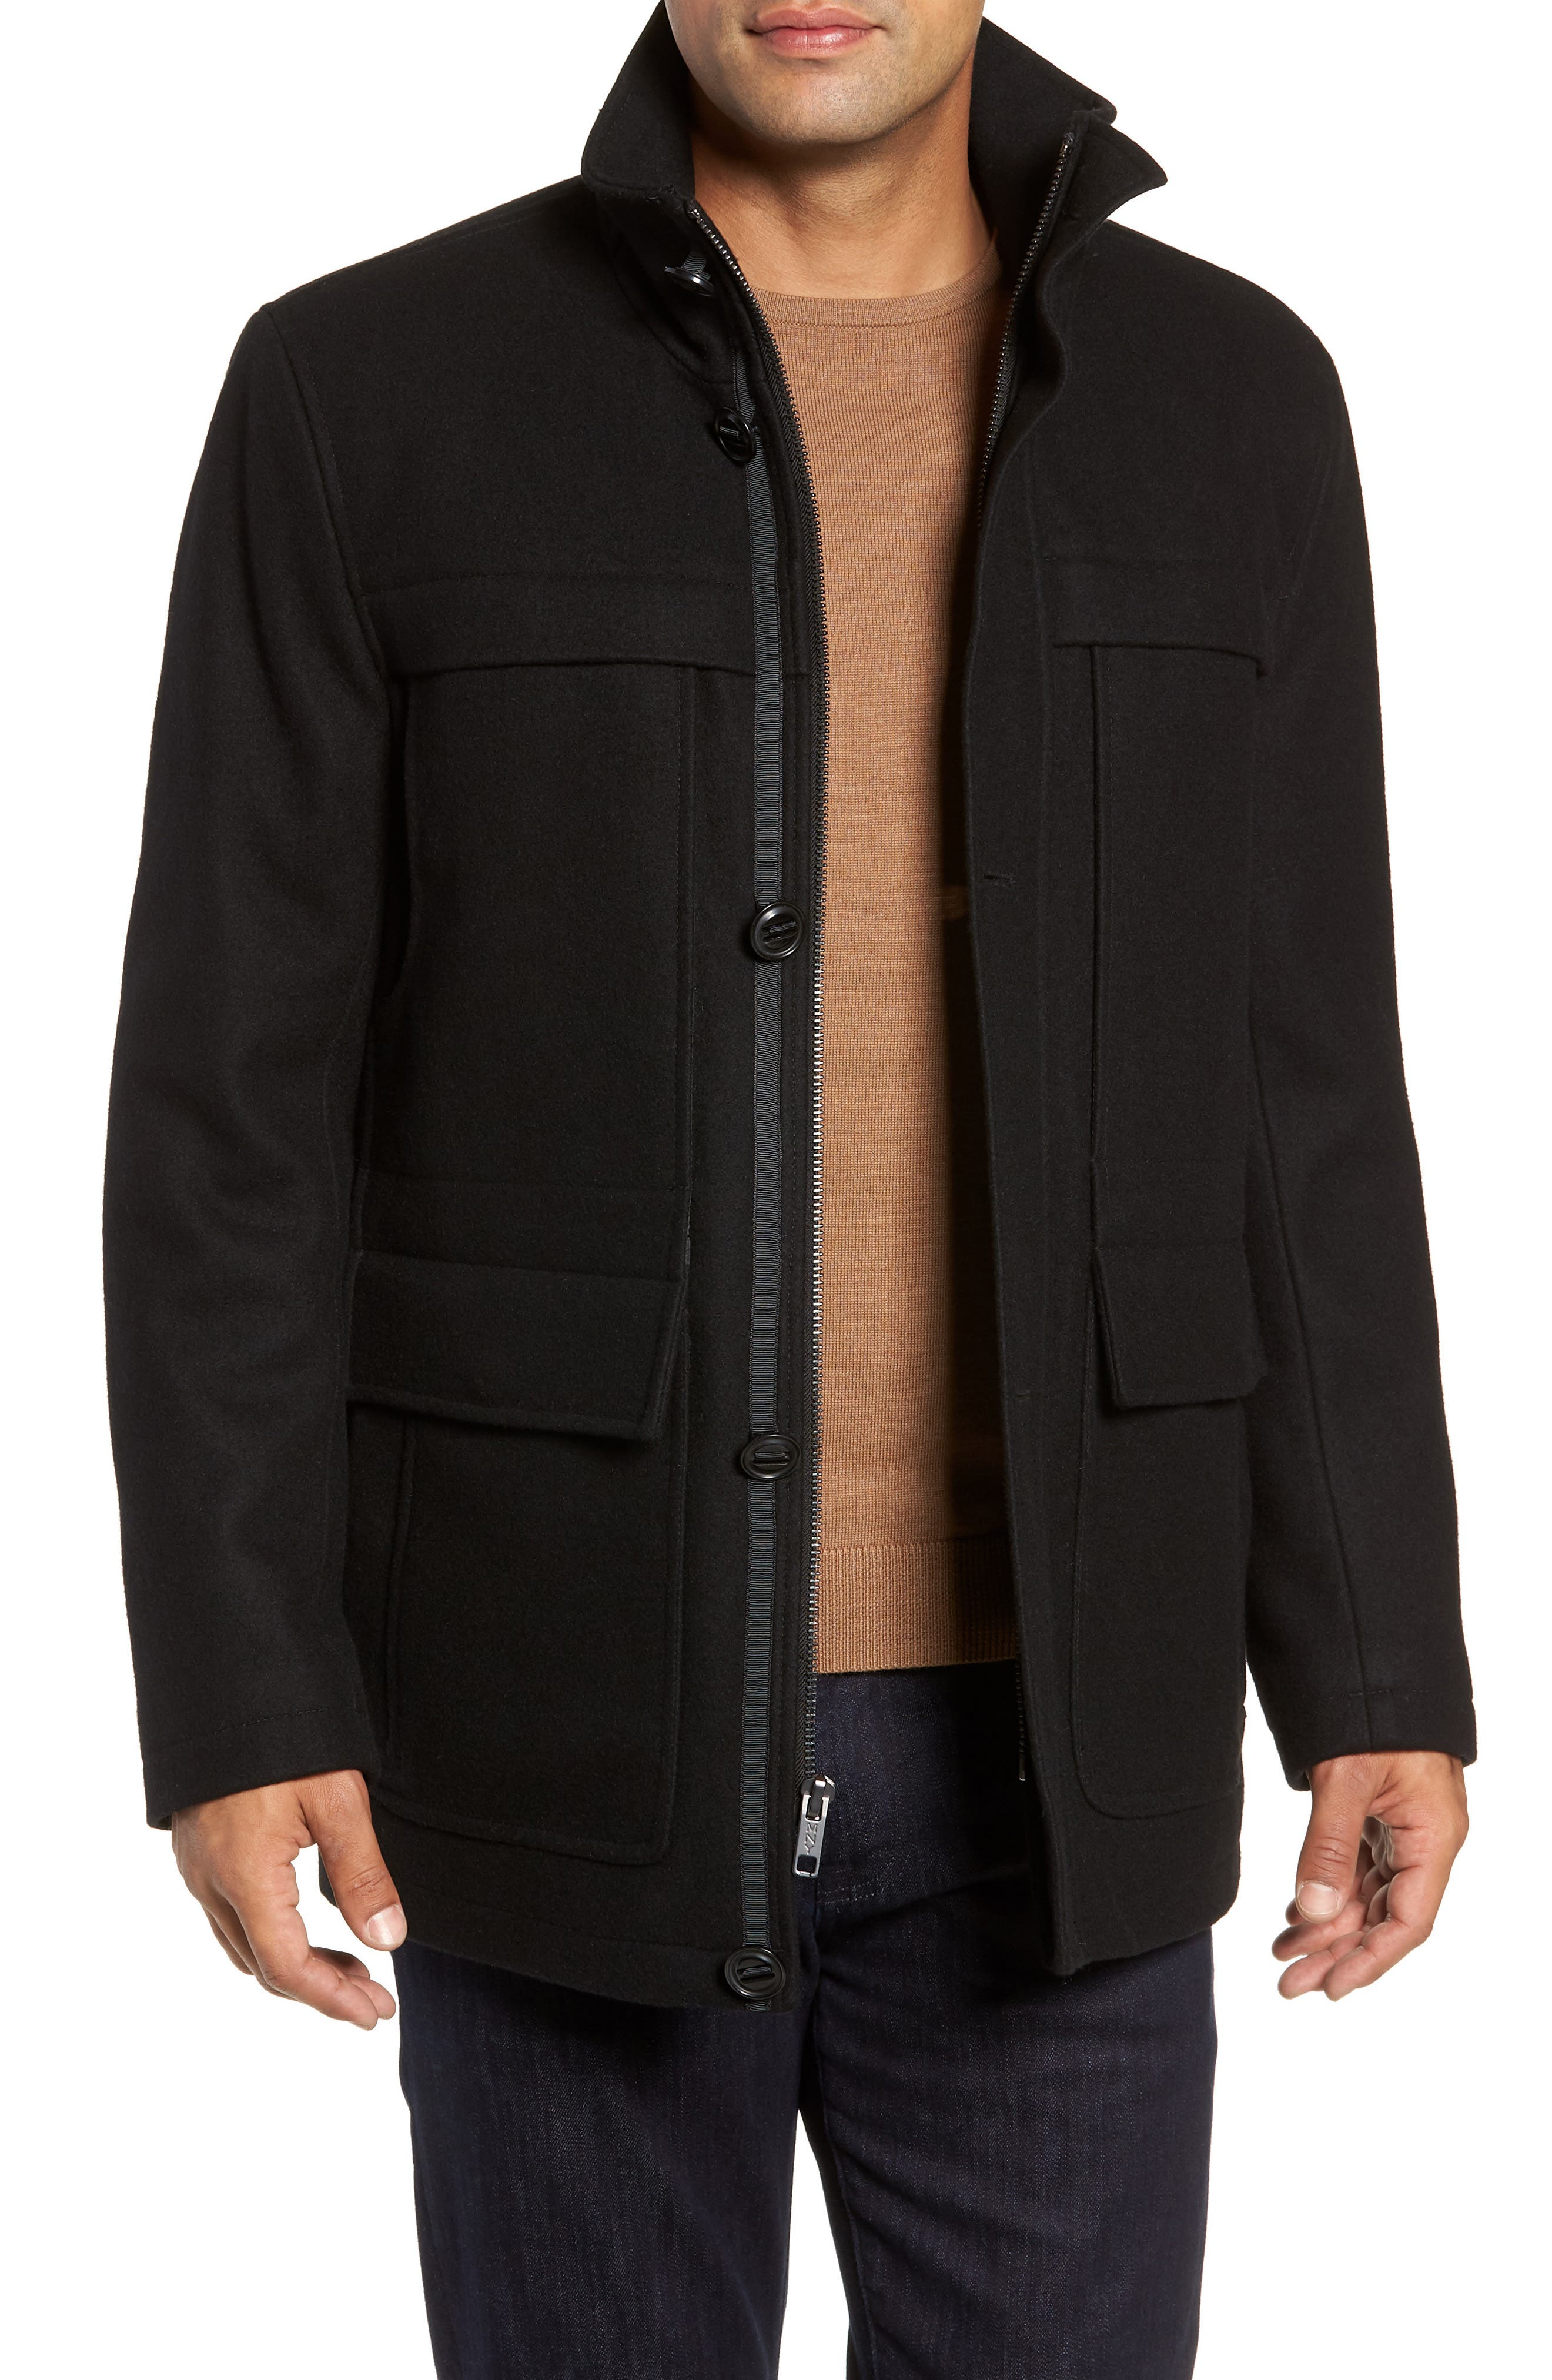 MARC NEW YORK Brantley Wool Blend Car Coat, Main, color, 001